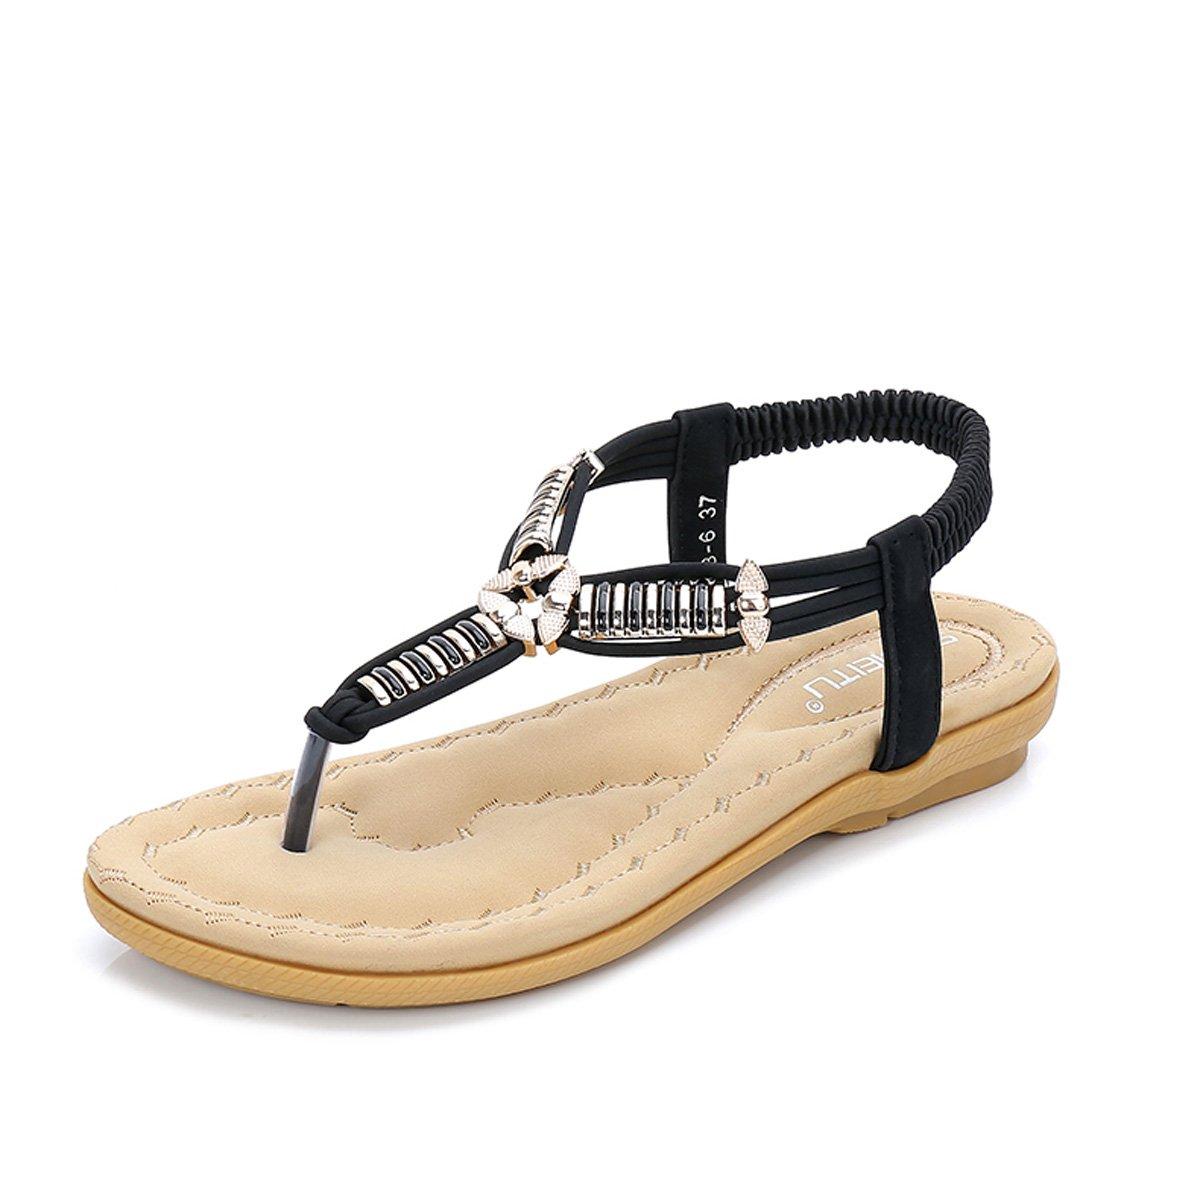 Gracosy Damen Sandalen, Flip Flops Flach Sommer Sandales Flach Flops Zehentrenner ... 5902c8